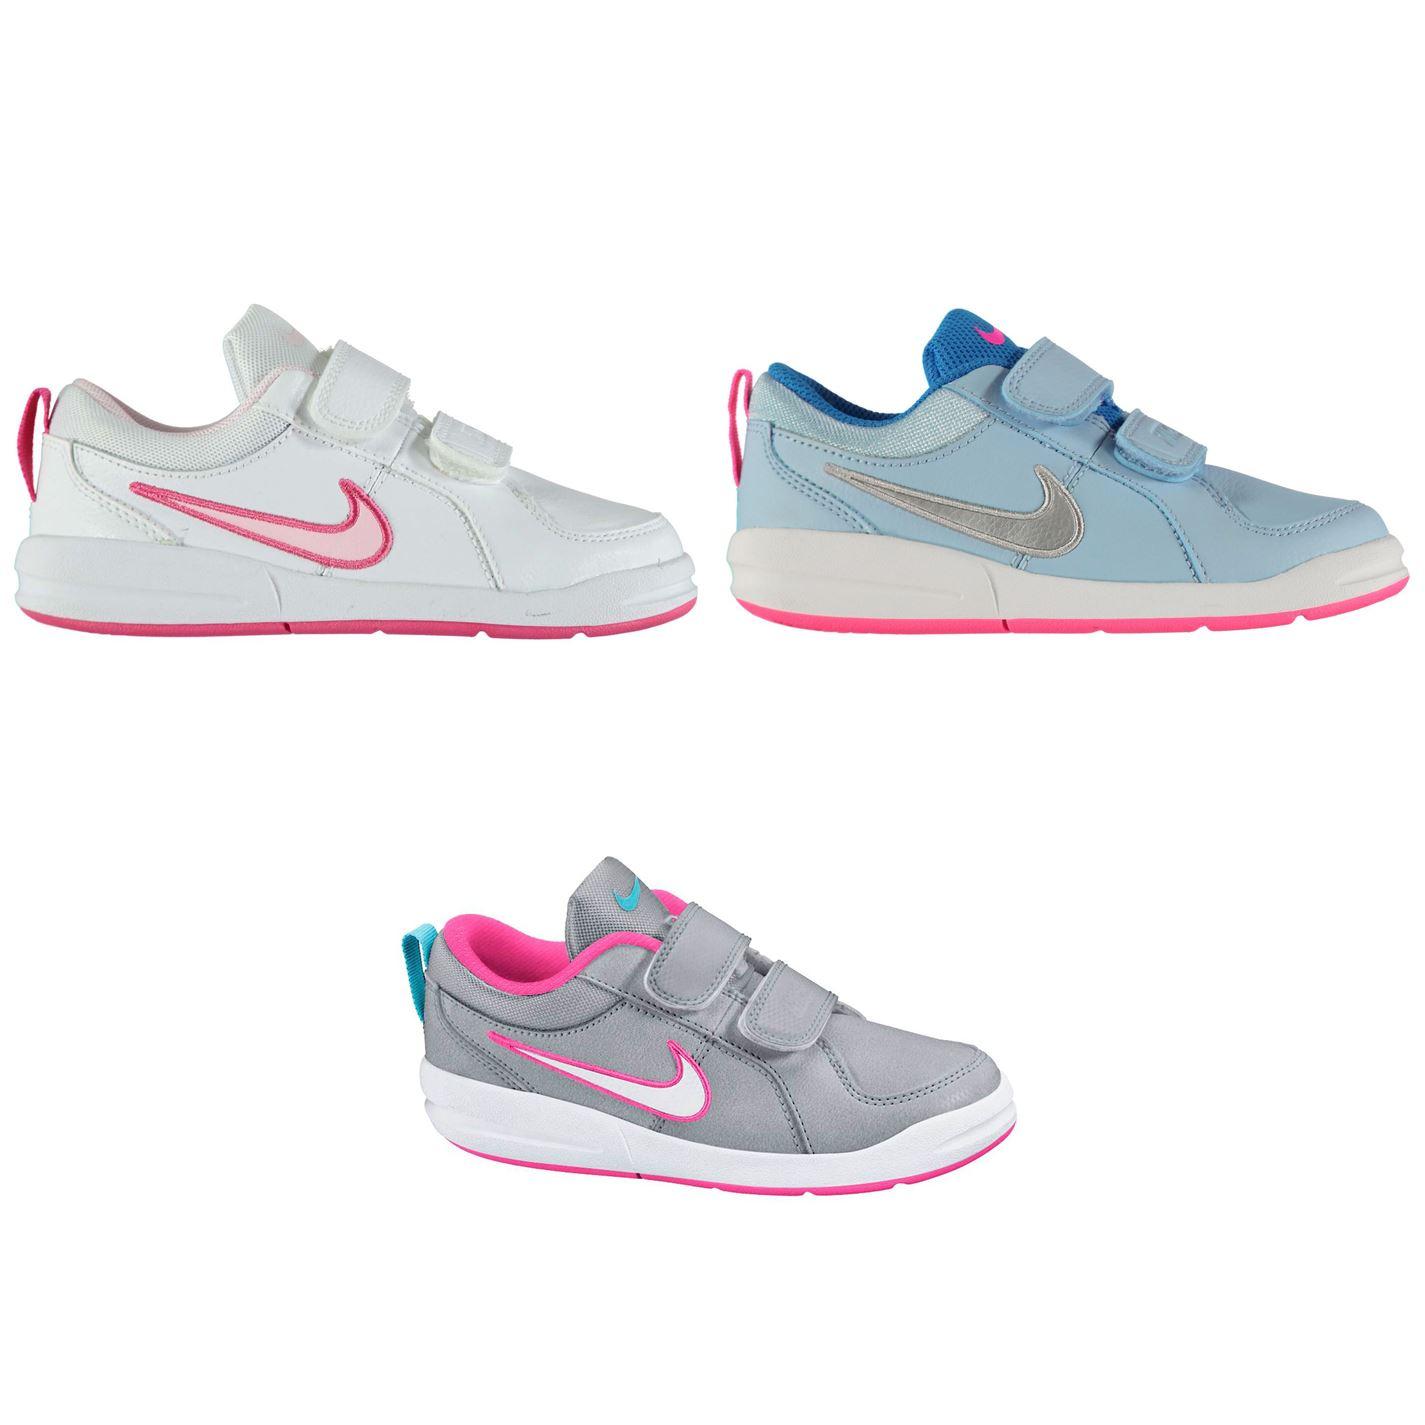 fbd08858b7 ... Nike Pico 4 Junior Girls Trainers Shoes Footwear ...